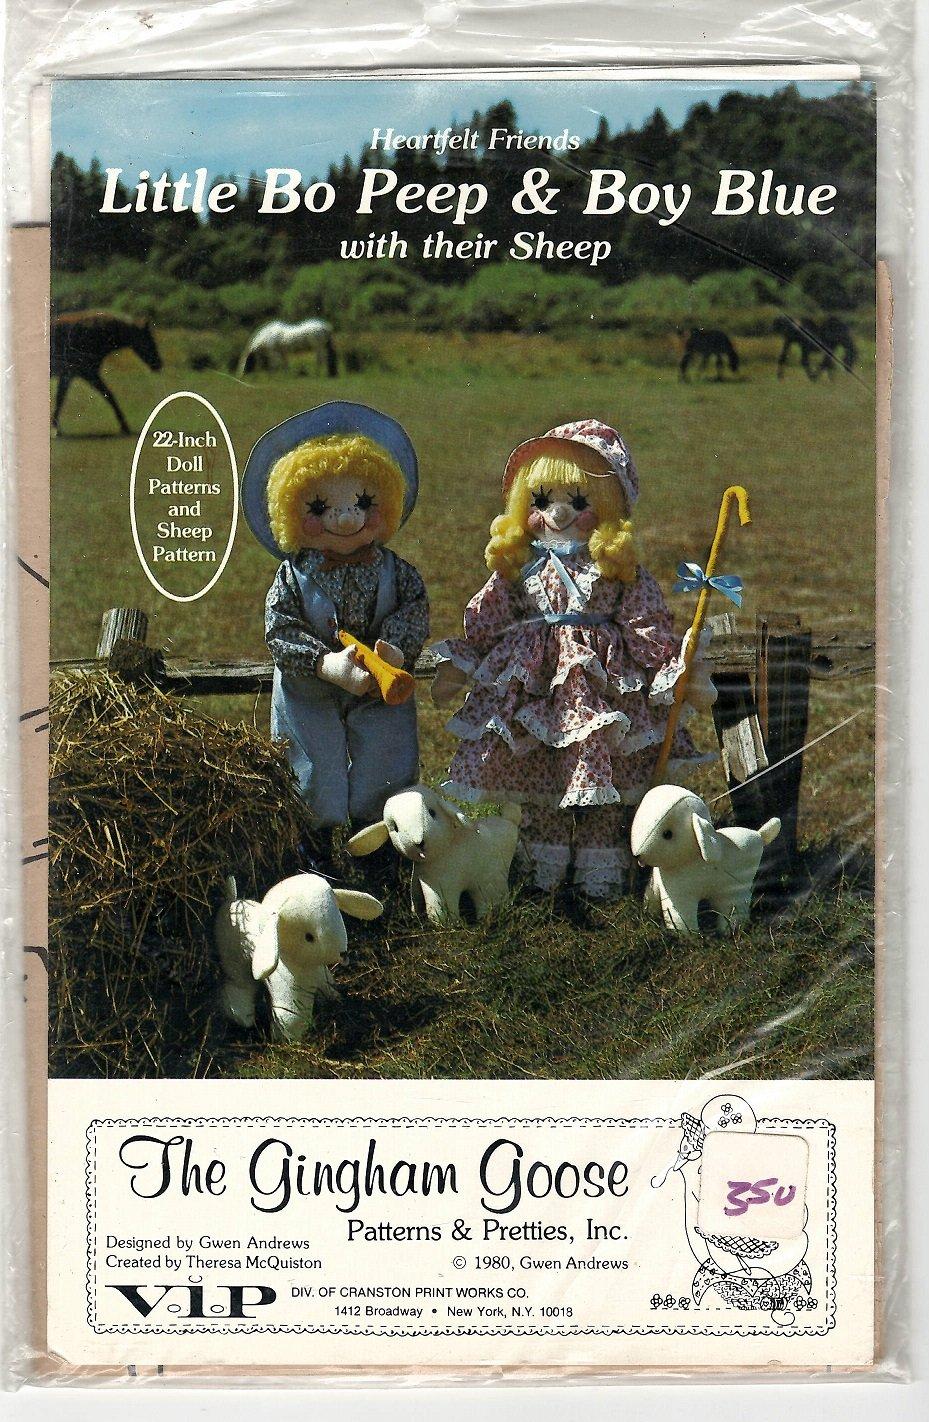 Little Bo Peep & Boy Blue & Their Sheep Pattern by The Gingham Goose - GGP 026 - Uncut